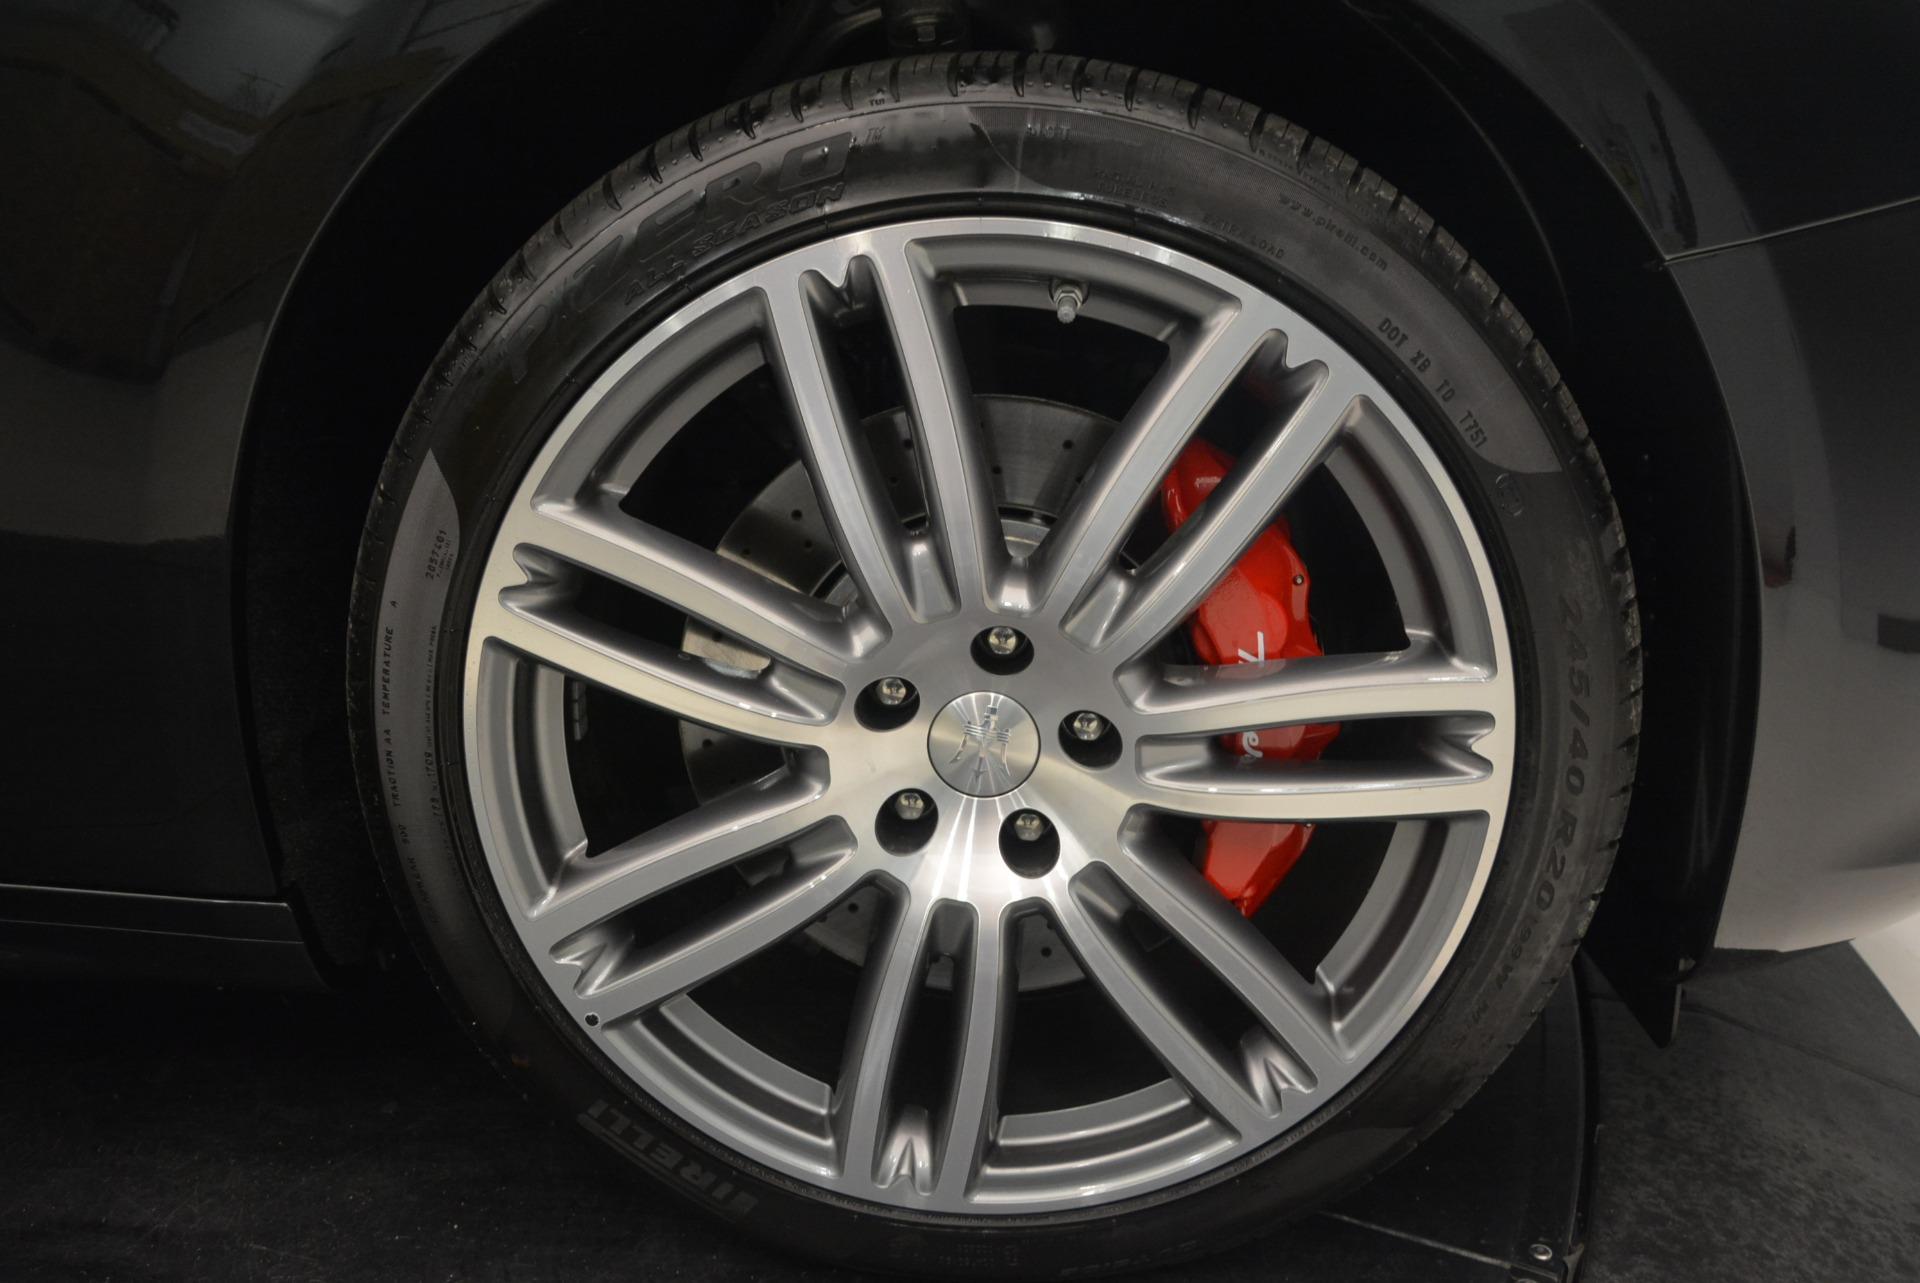 New 2018 Maserati Ghibli S Q4 Gransport For Sale In Greenwich, CT 2036_p25